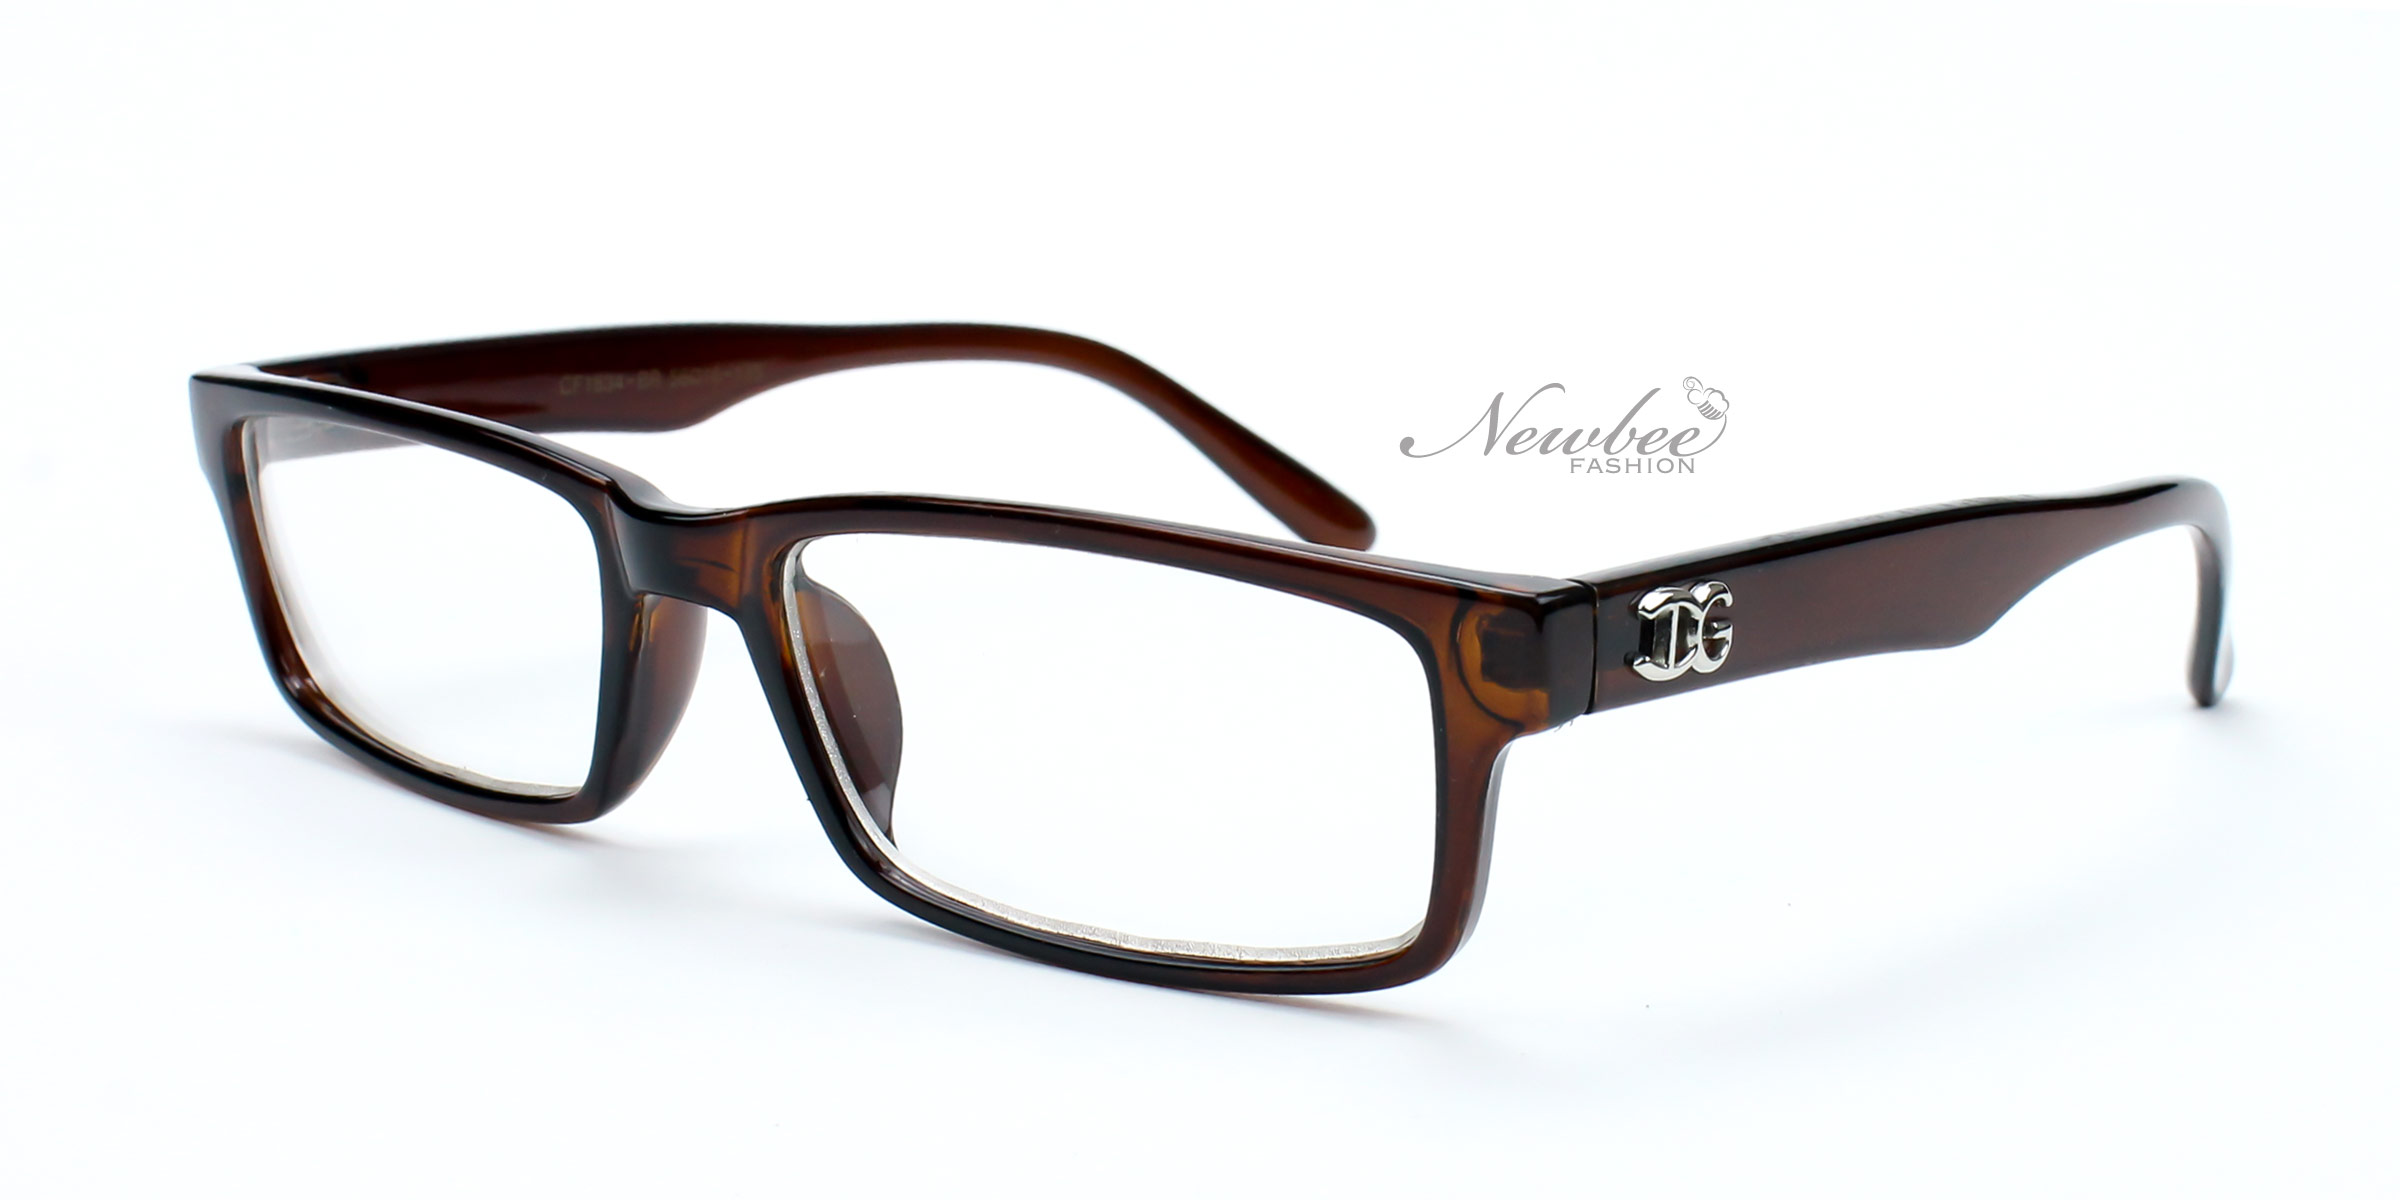 Black Frame Glasses Non Prescription : Black Teal Rectangular Frame Non Prescription Clear Lens ...